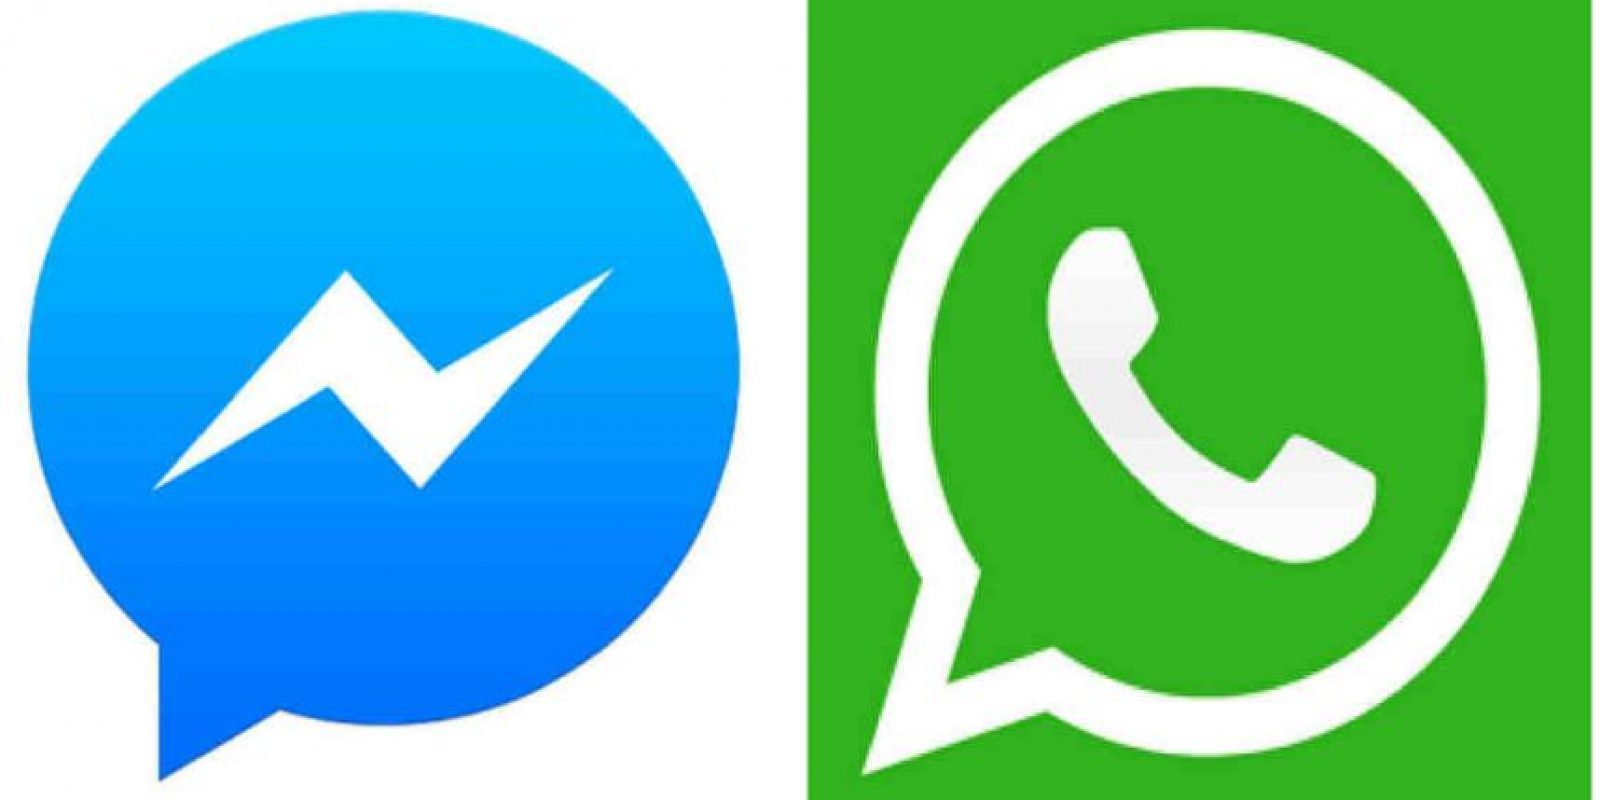 Ambas aplicaciones pertenecen a Facebook. Foto:Messenger/WhatsApp